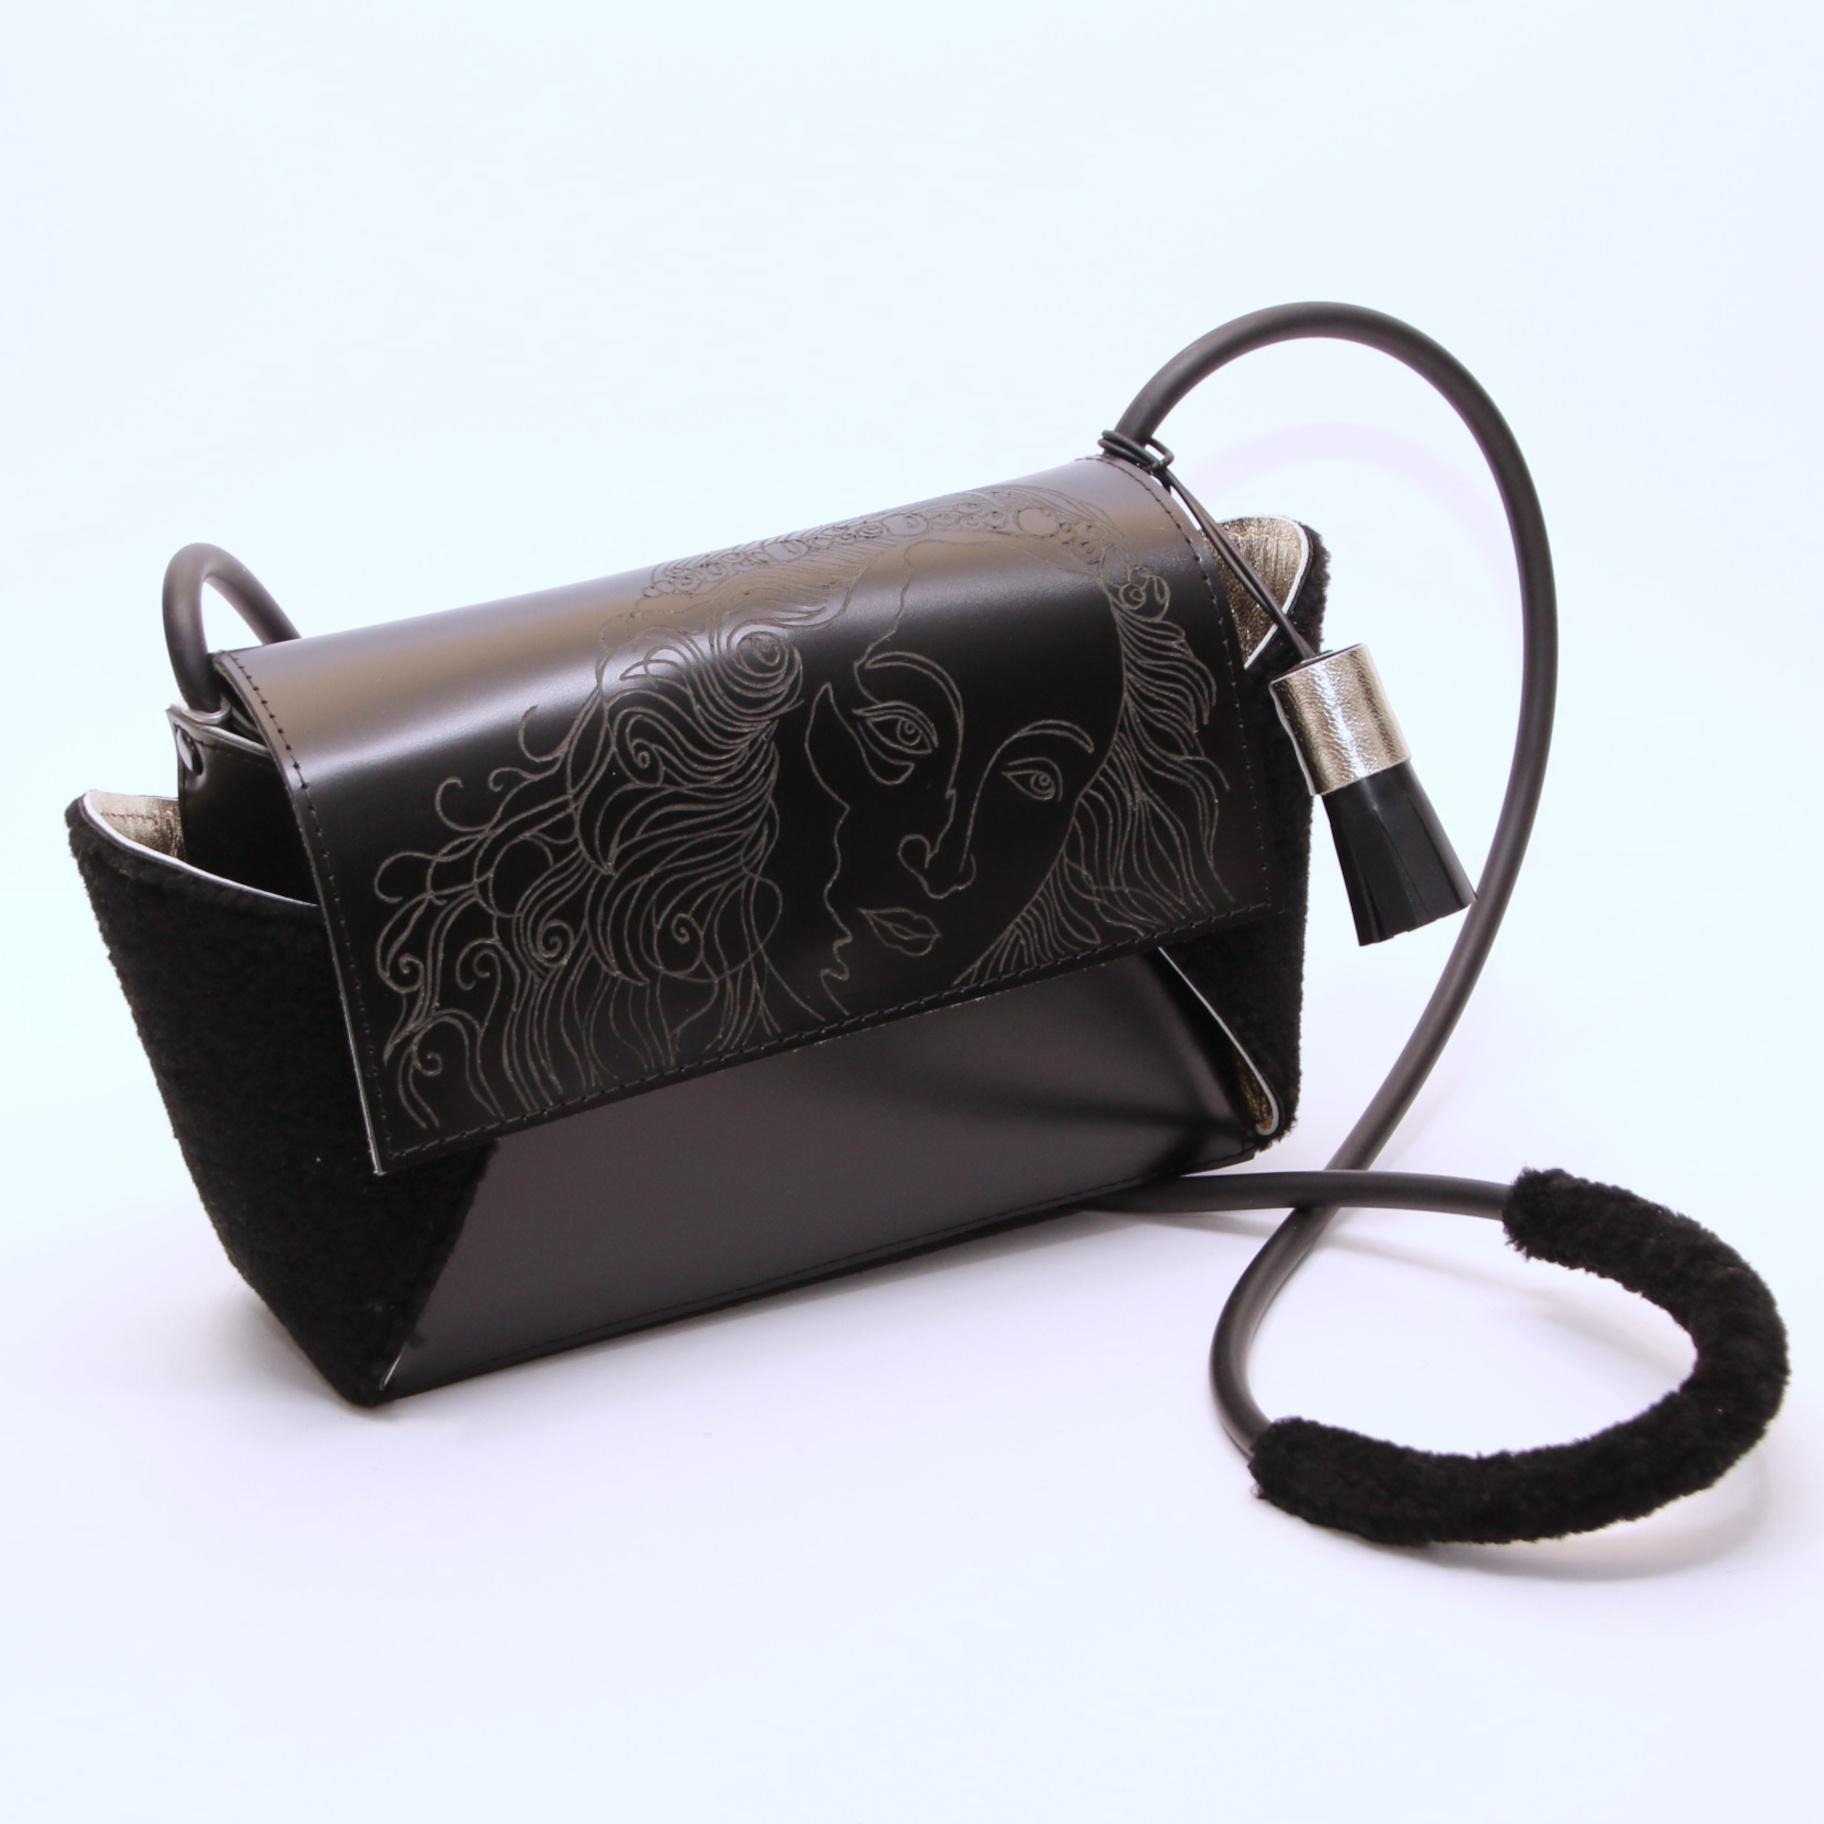 PAARL Unique handmade and engraved handbag - PAARL